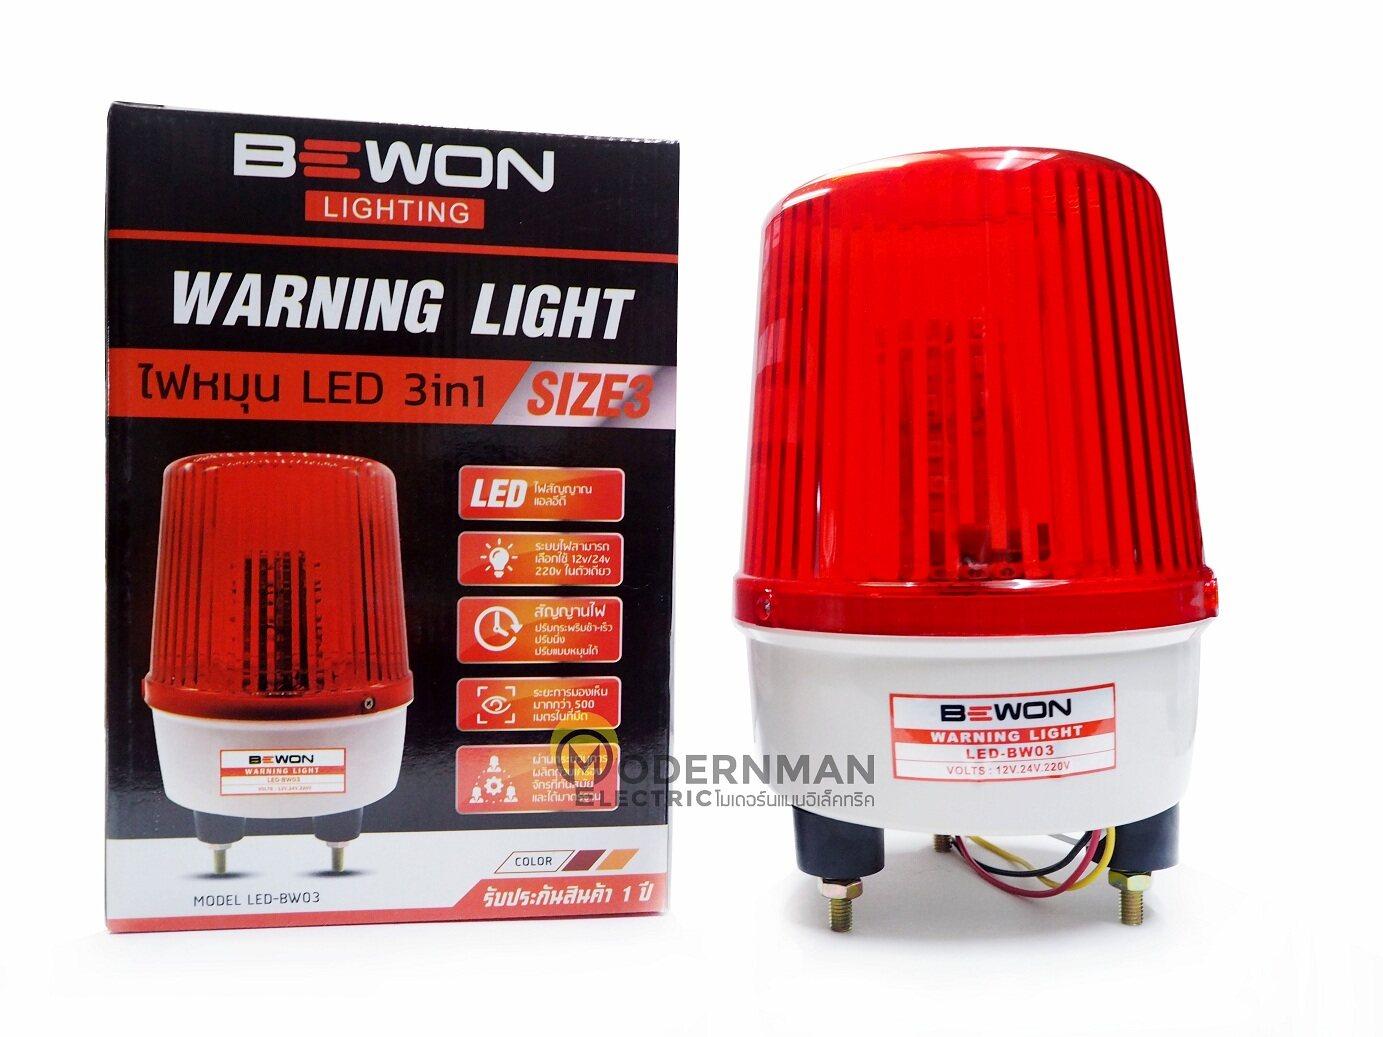 Bewon ไซเรน Led 3in1 เลือกใช้ระบบไฟ 220v 24v 12v ได้ในตัวเดียว ไฟฉุกเฉิน ขอทาง สัญญาณ ไฟหมุน ไฟไซเรน Siren เบอร์3 ขนาด 5.5 นิ้ว.